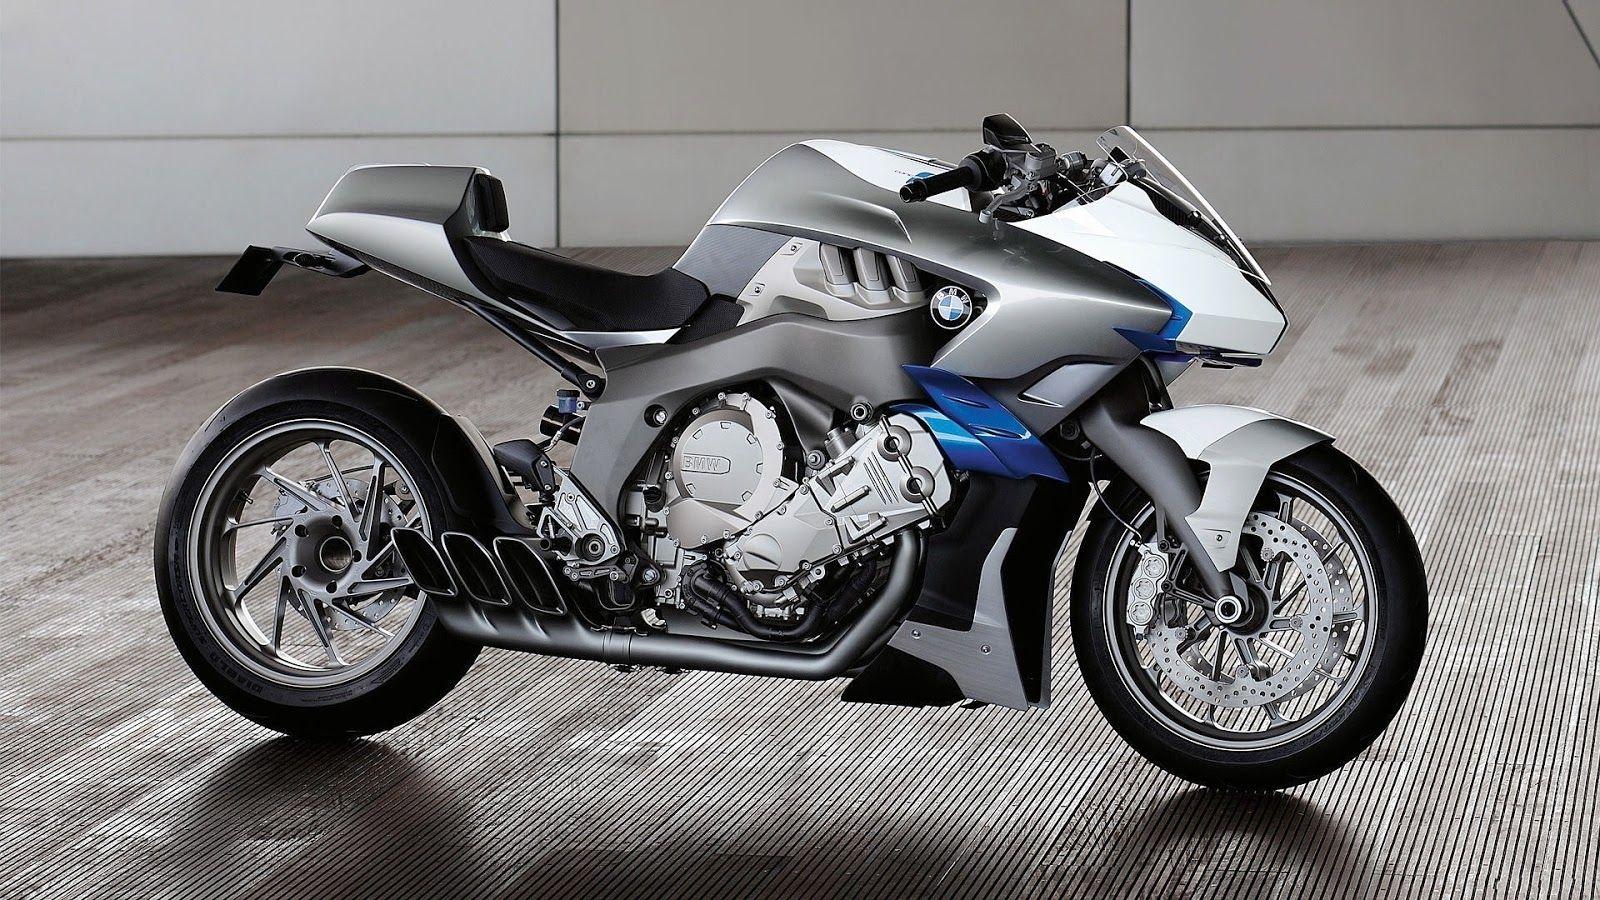 Wallpaper download bike - Bike Hd Wallpapers Of Bike 1080p Customize Chopper Bike Wallpaper